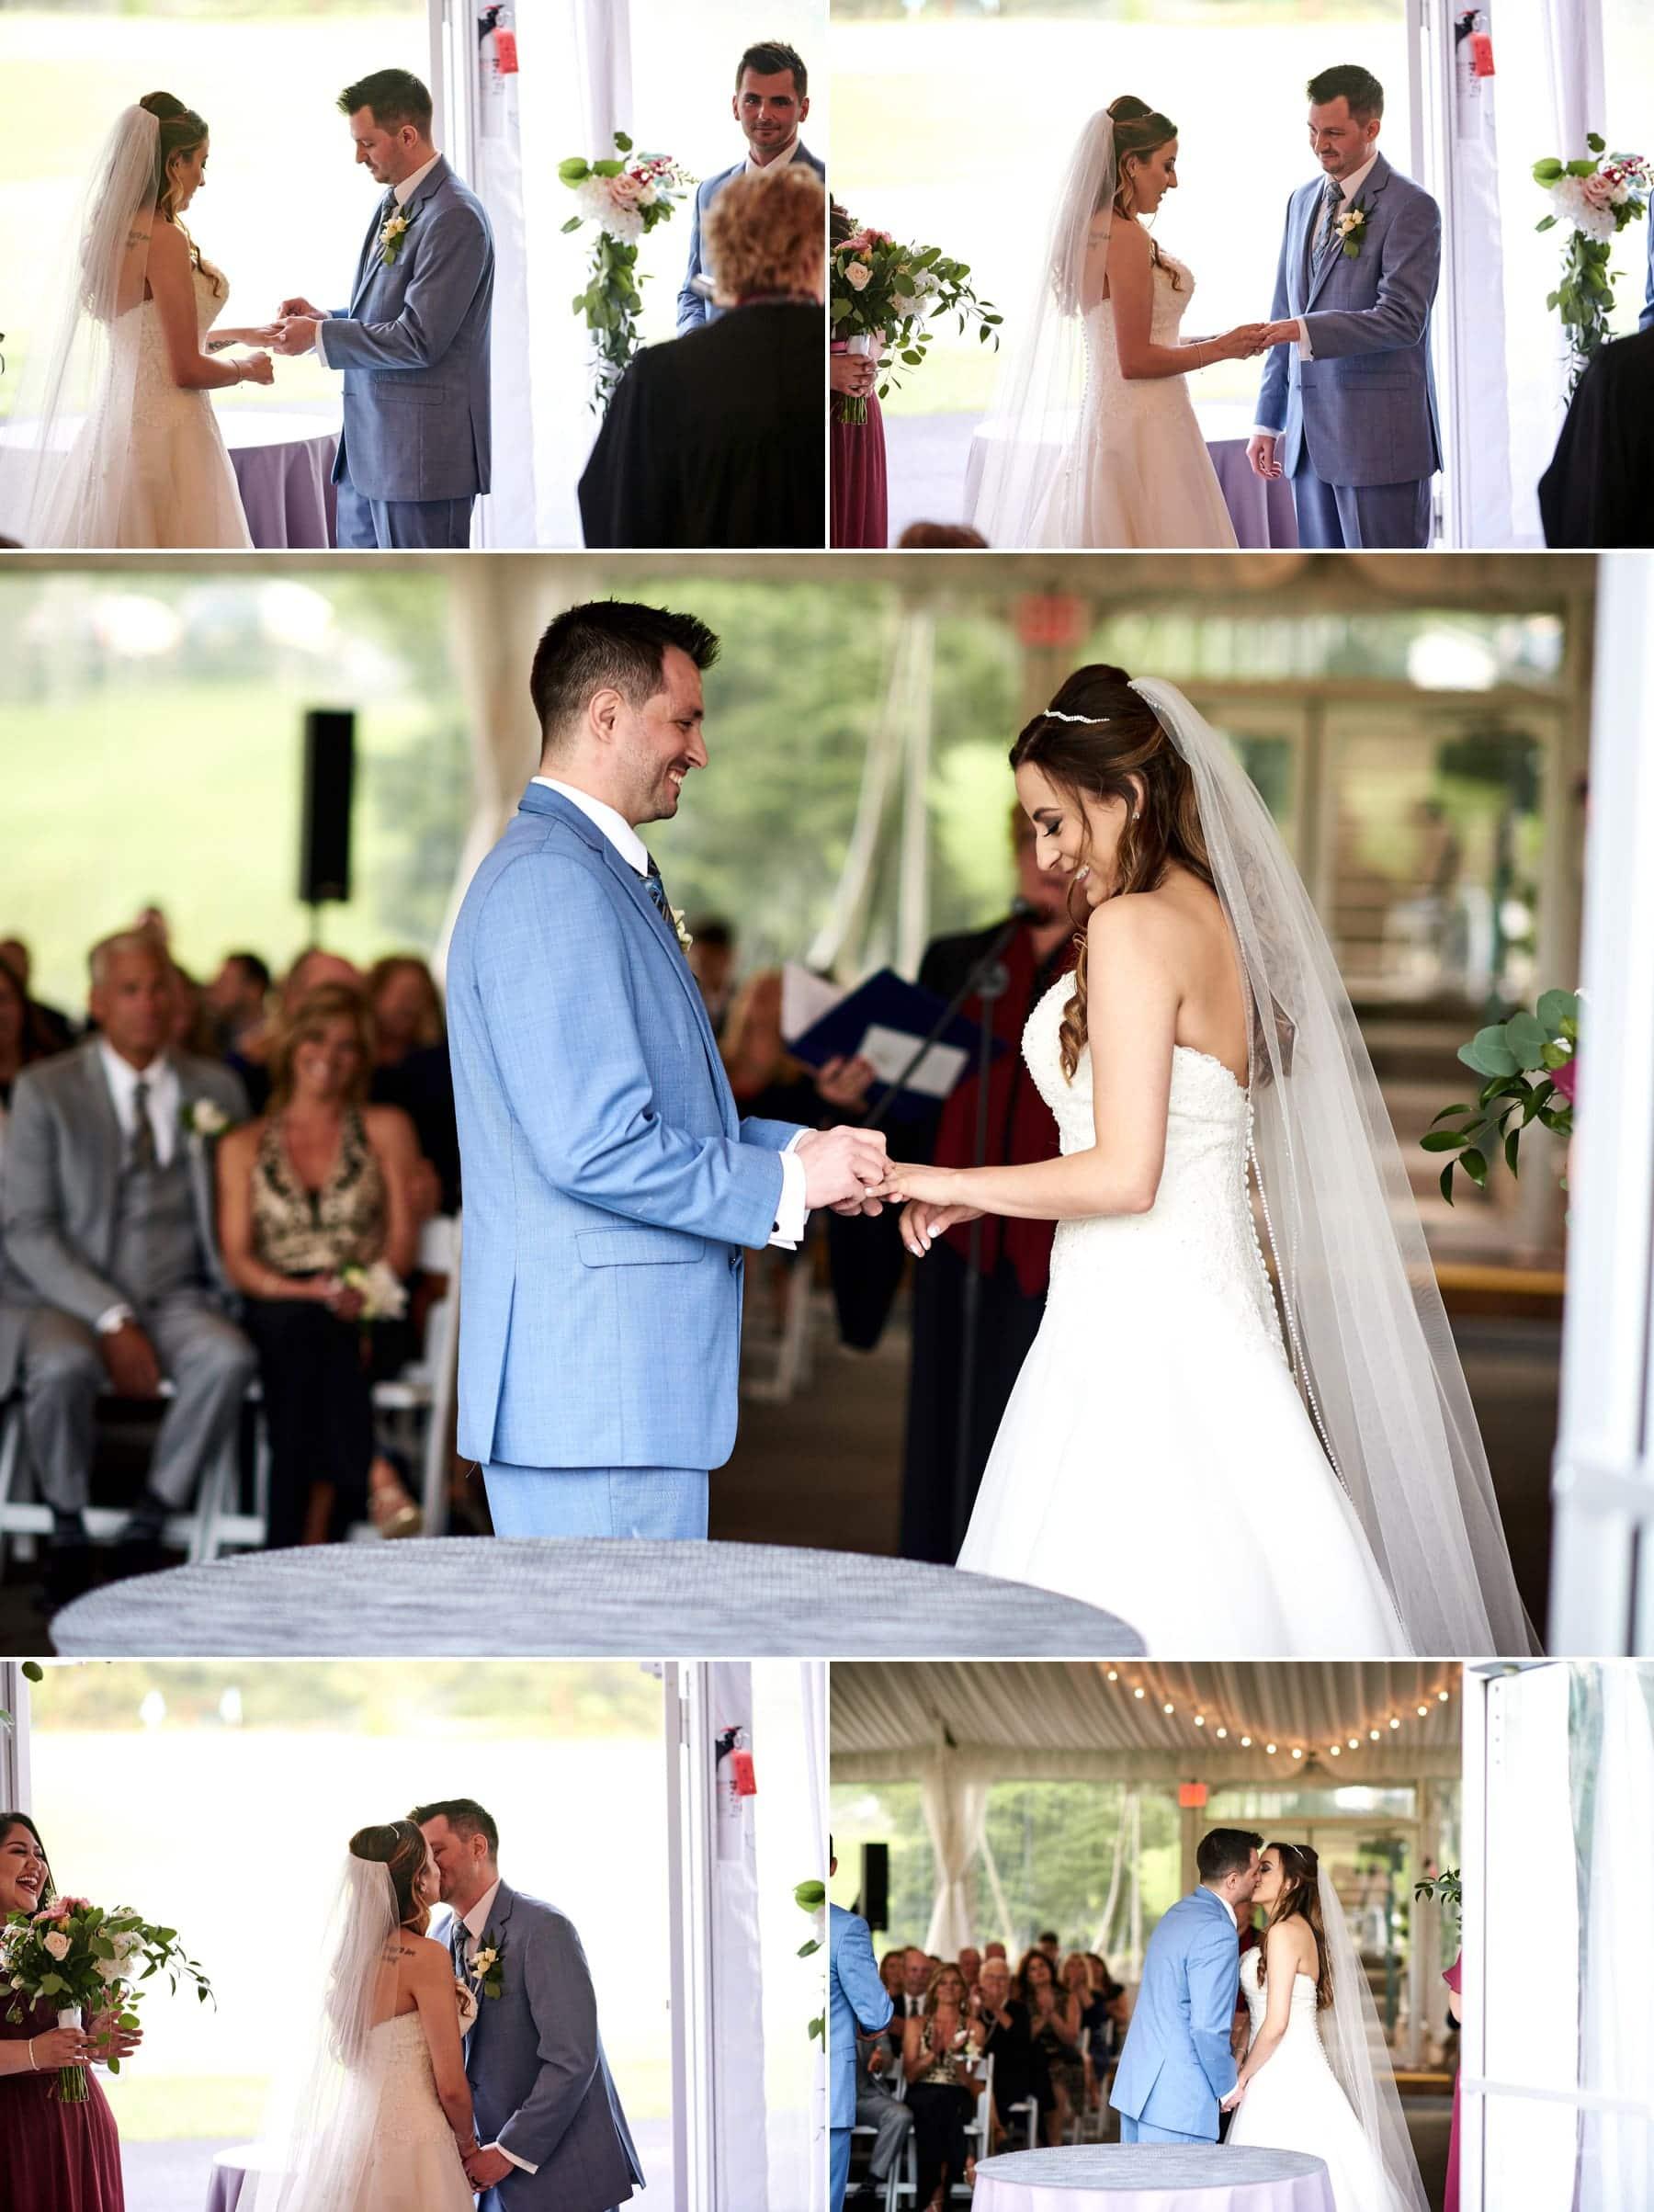 wedding ceremony photos at basking ridge country club